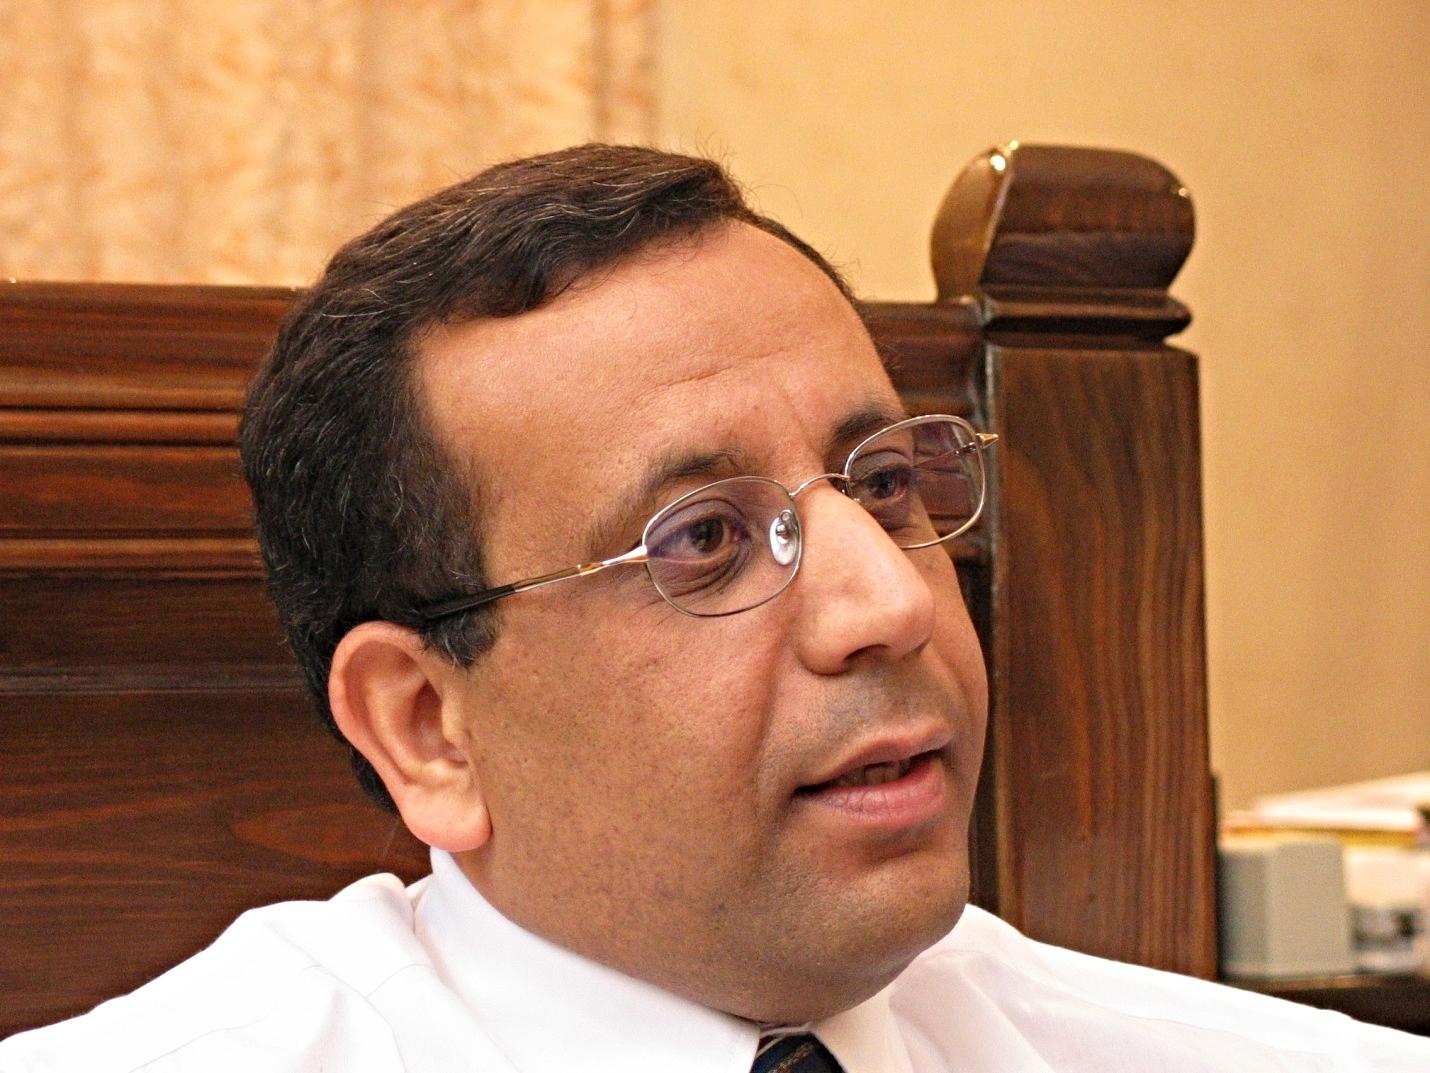 Dr. Atef Gendy